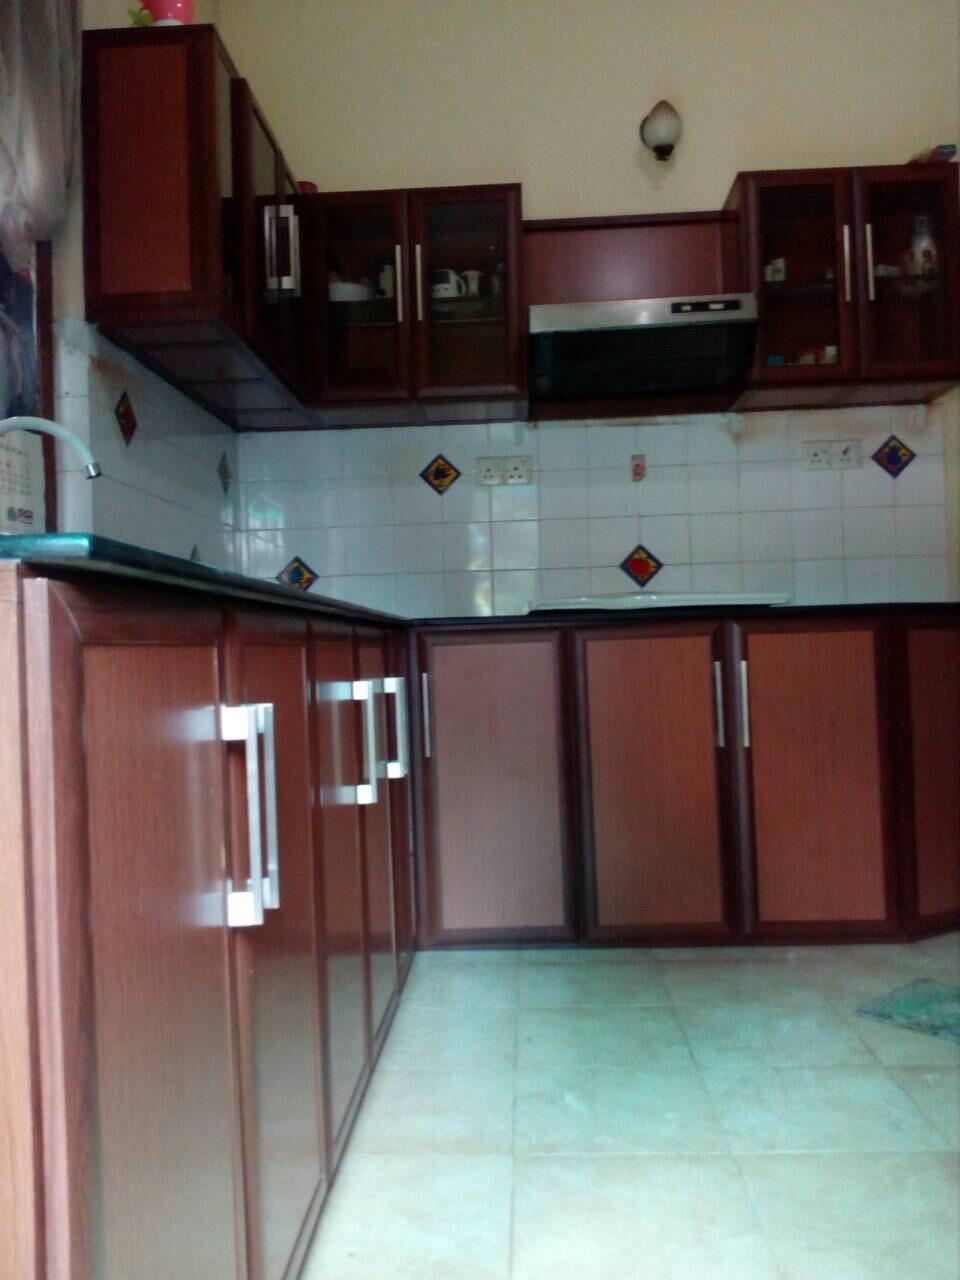 Aluminium Pantry Cupboards - DT - Enterprises | Steel